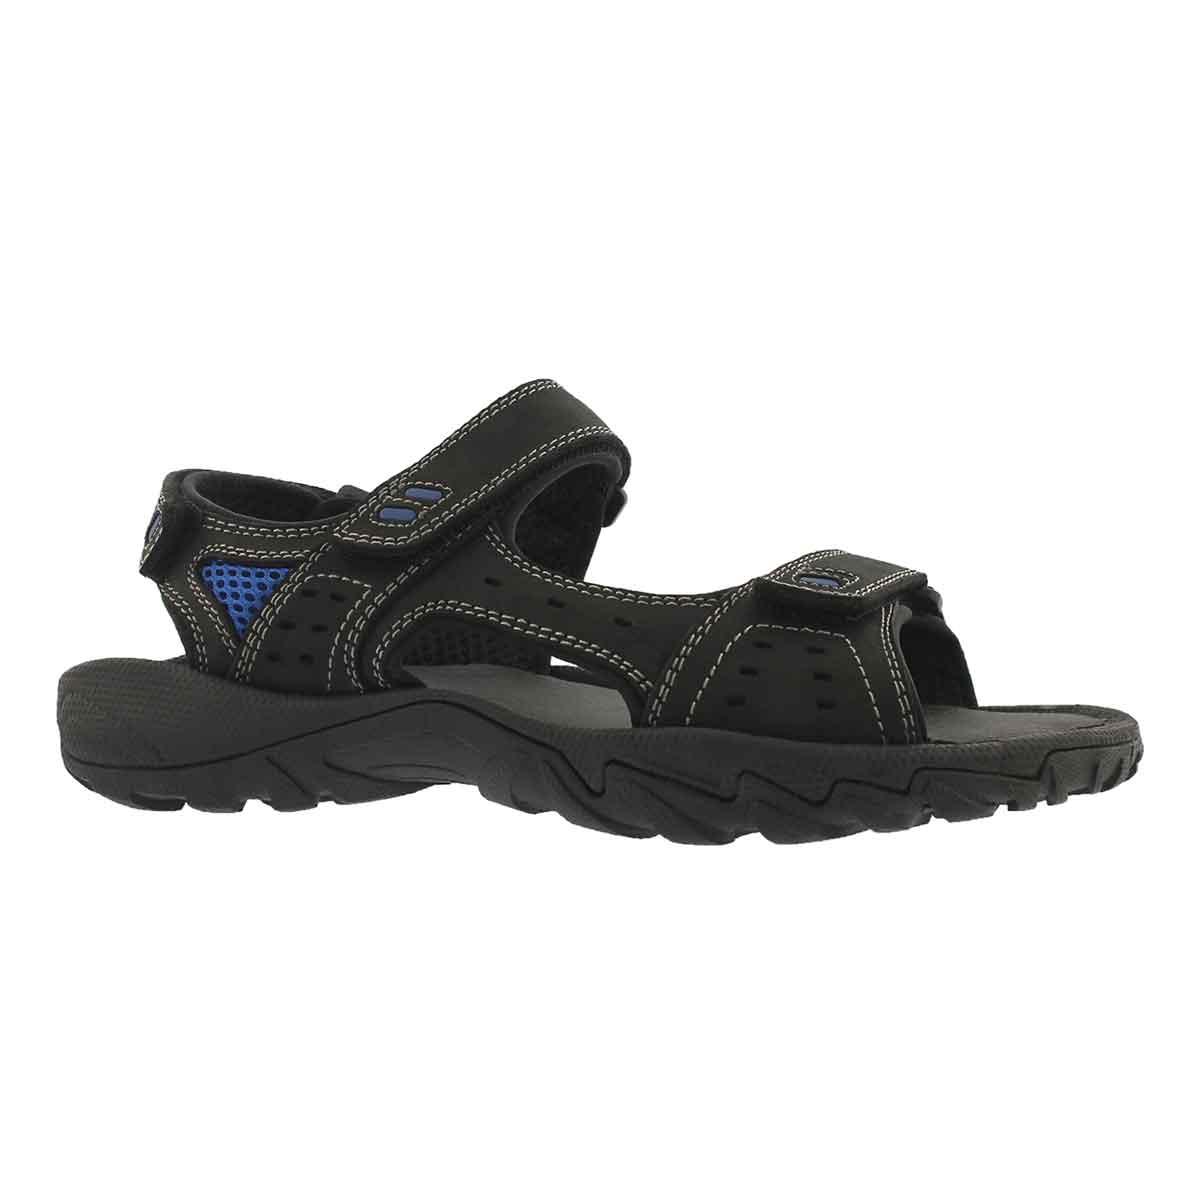 Mne's LUCIUS 3 black 3 strap sport sandals